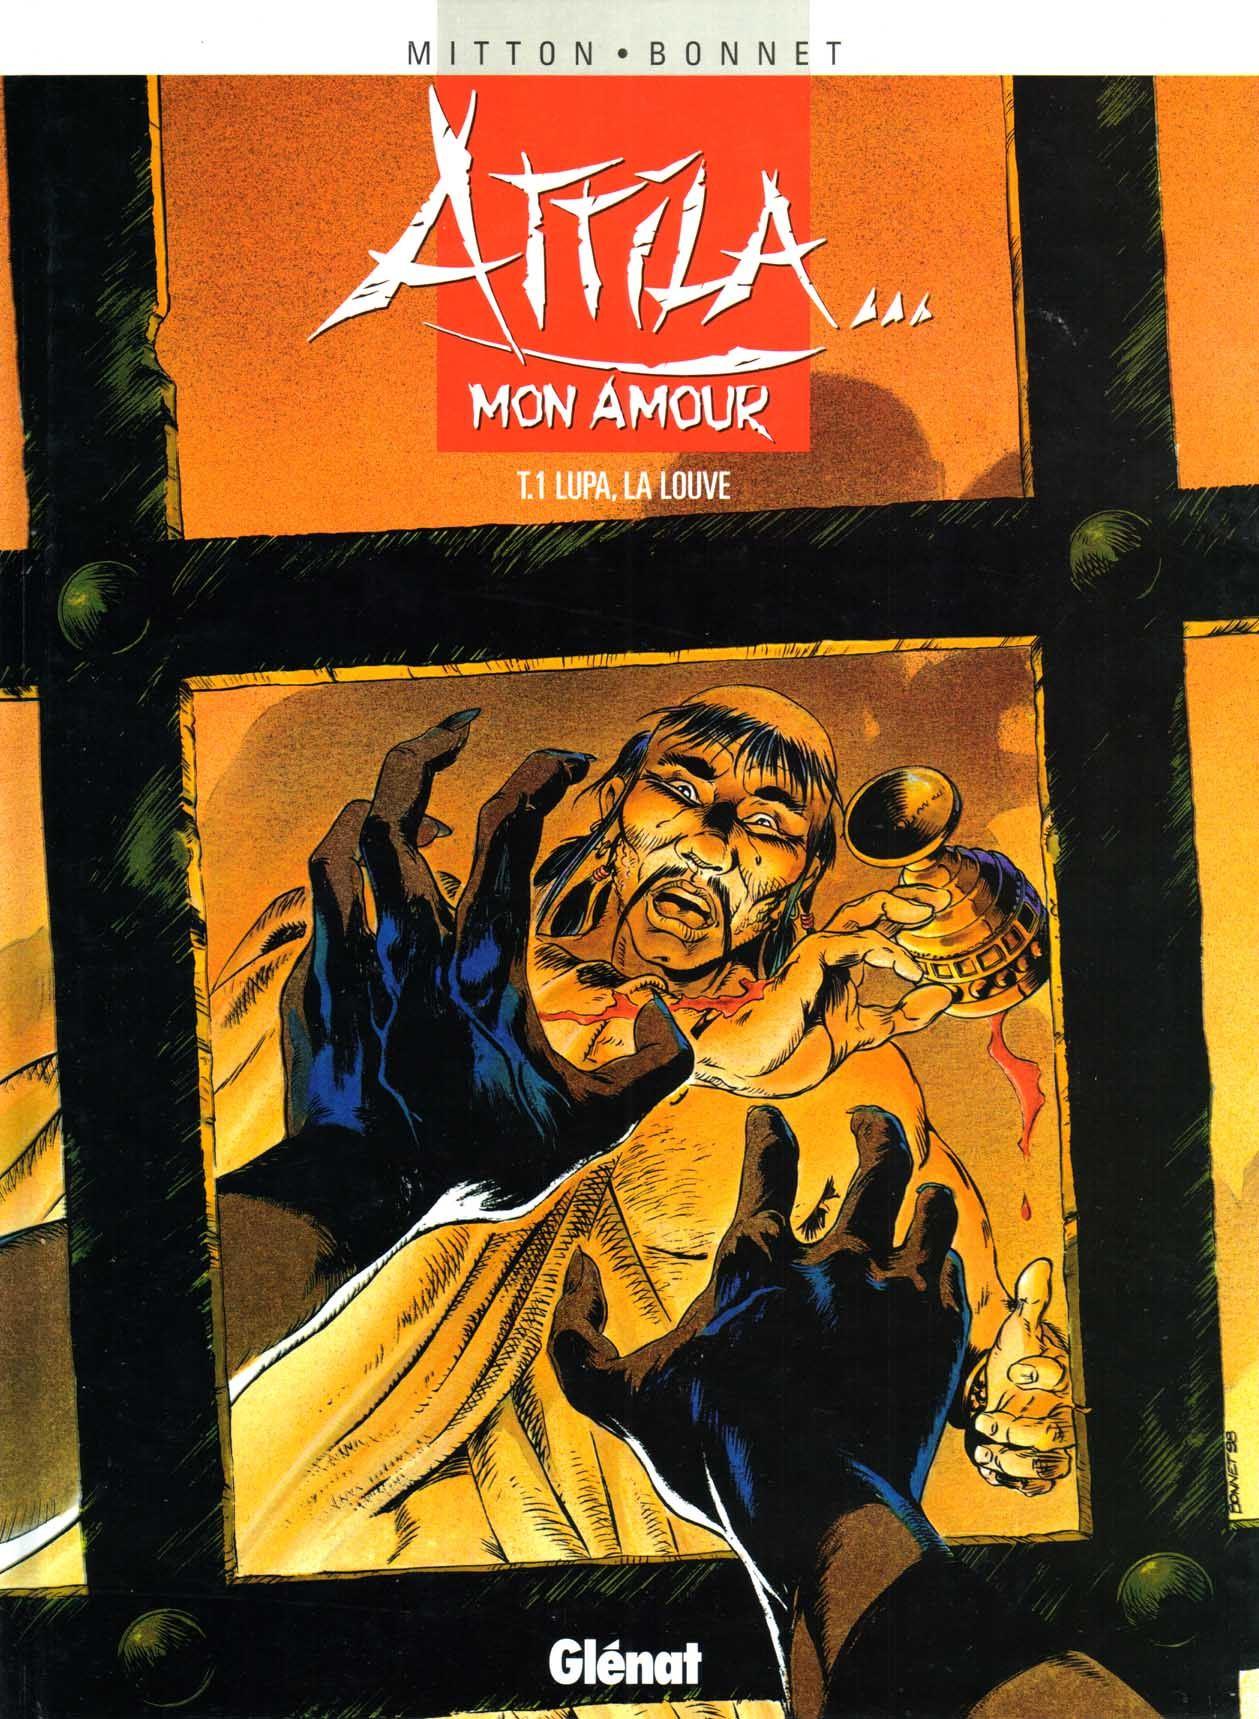 Attila Mon Amour 1 Lupa la Louve de Jean-Yves Mitton, Franck Bonnet